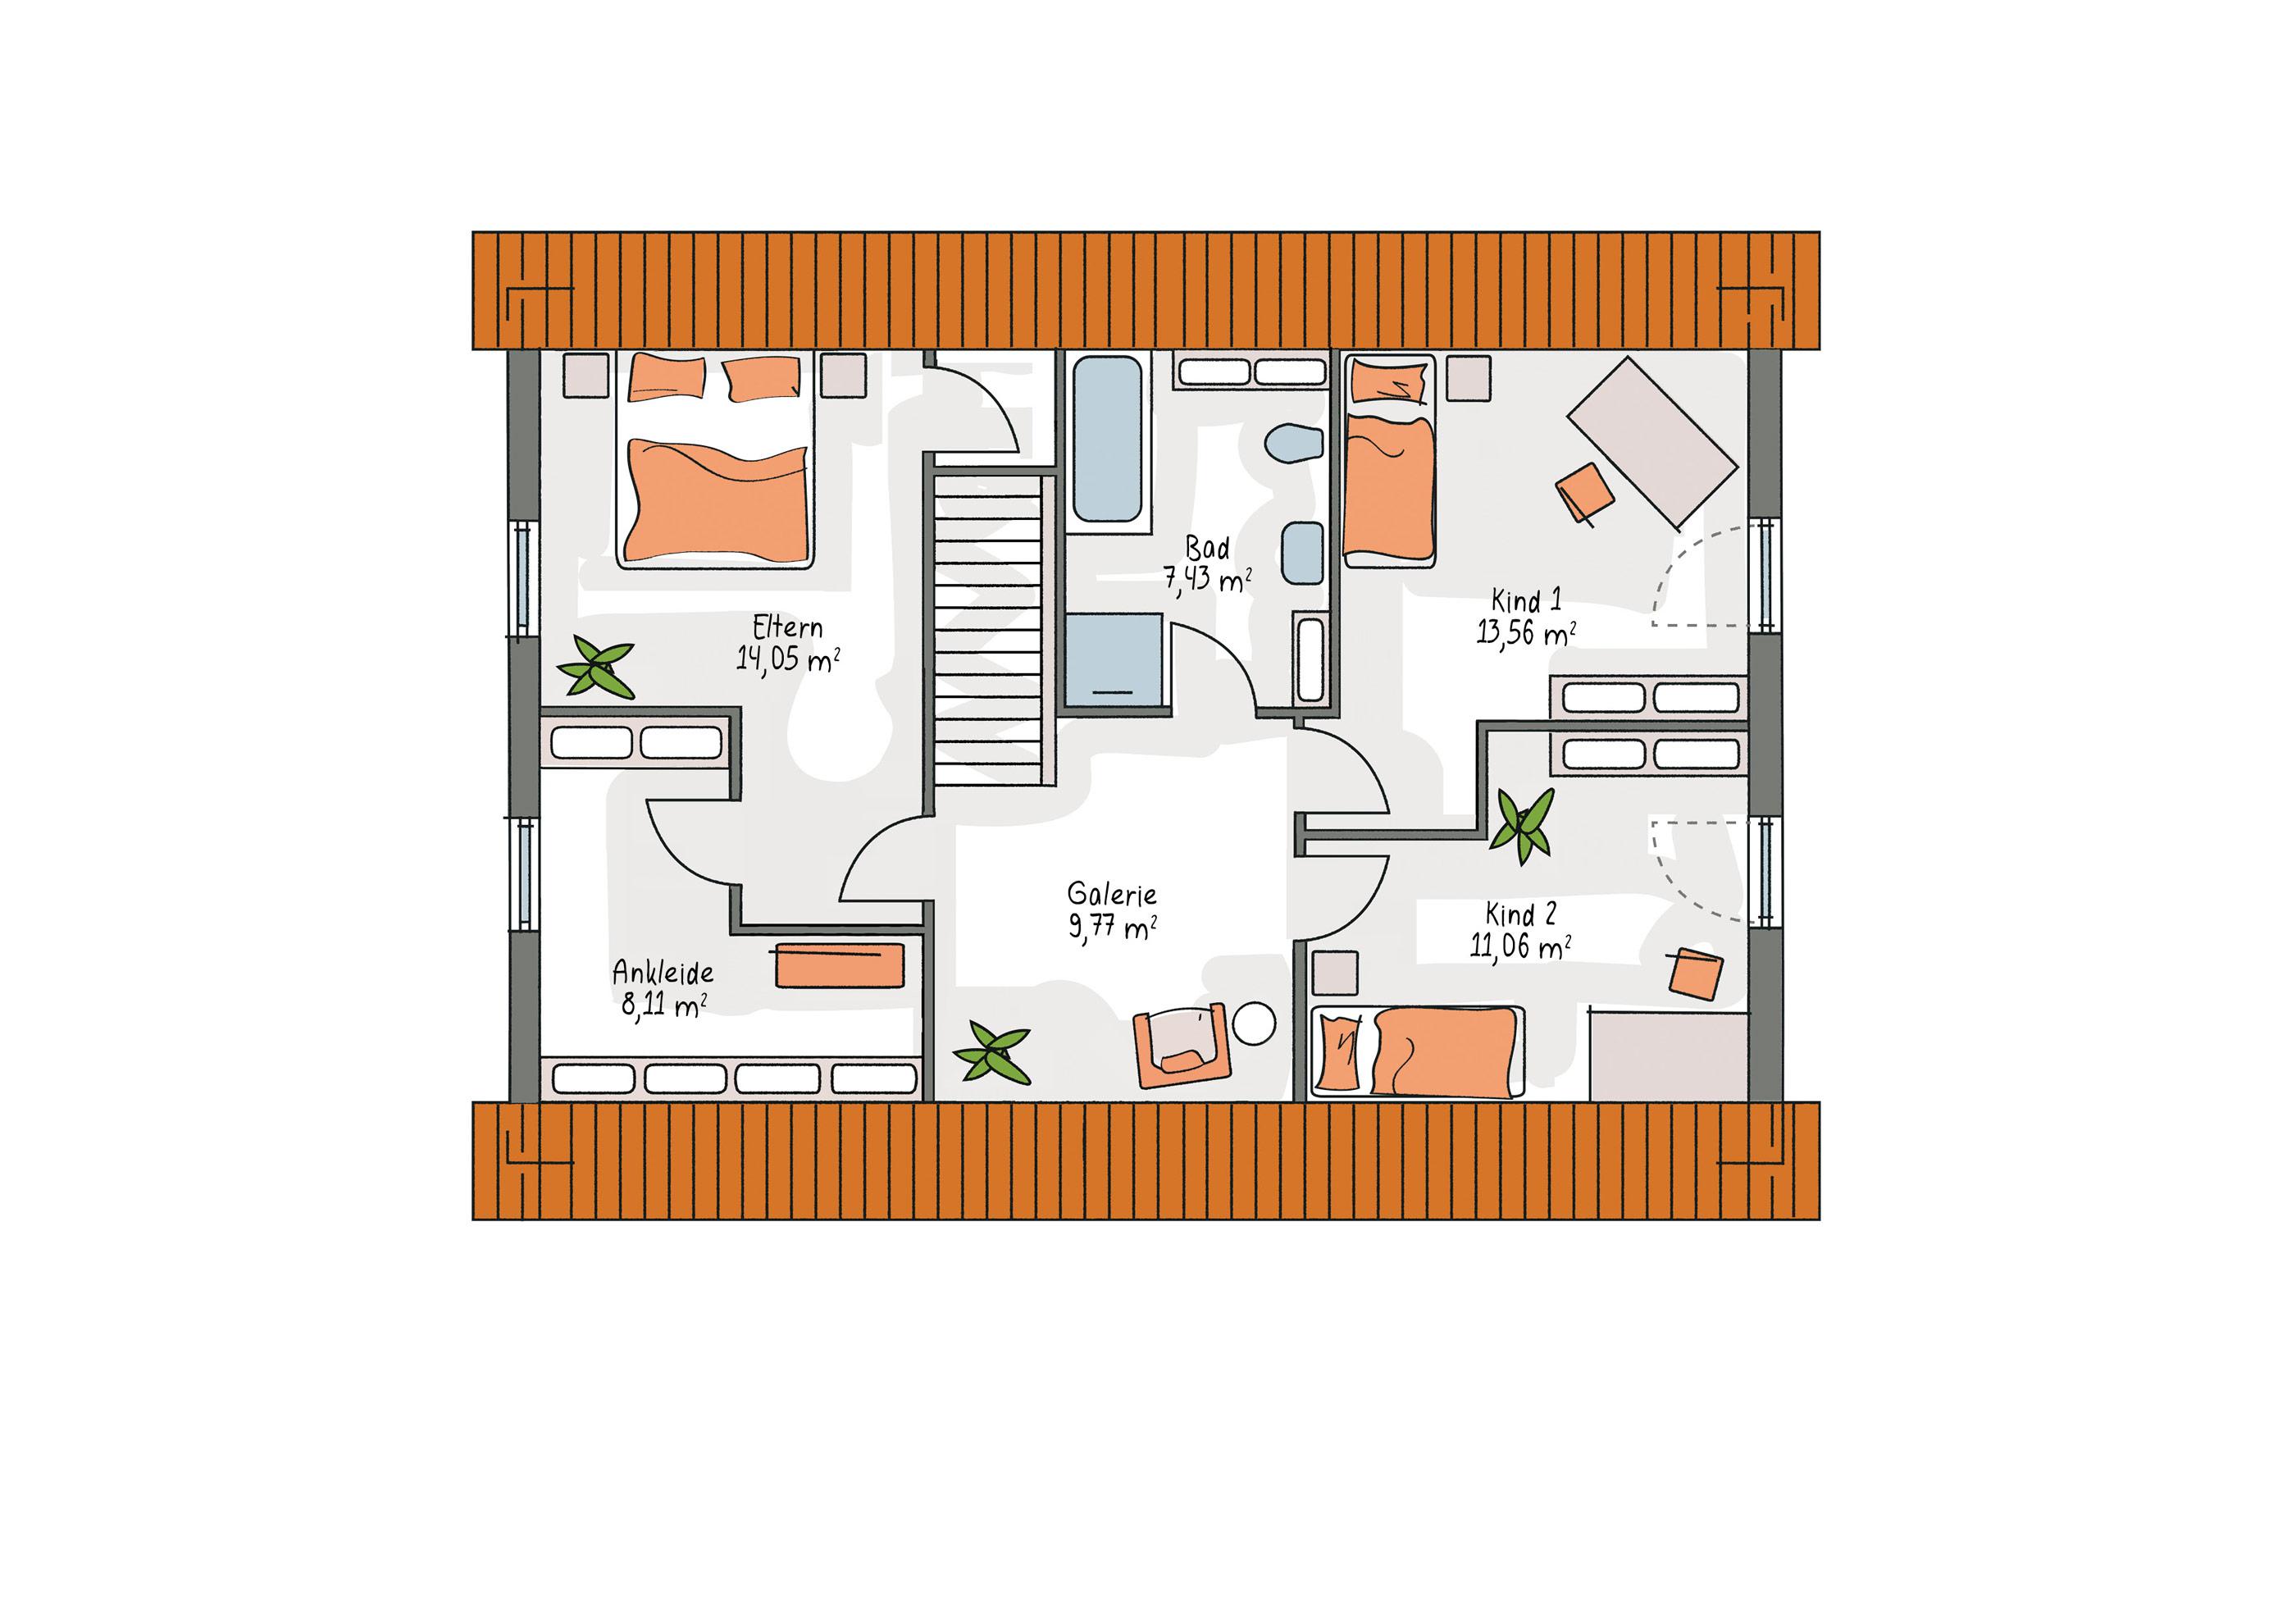 dennert fertighaus preise perfect bungalow glano kampa. Black Bedroom Furniture Sets. Home Design Ideas